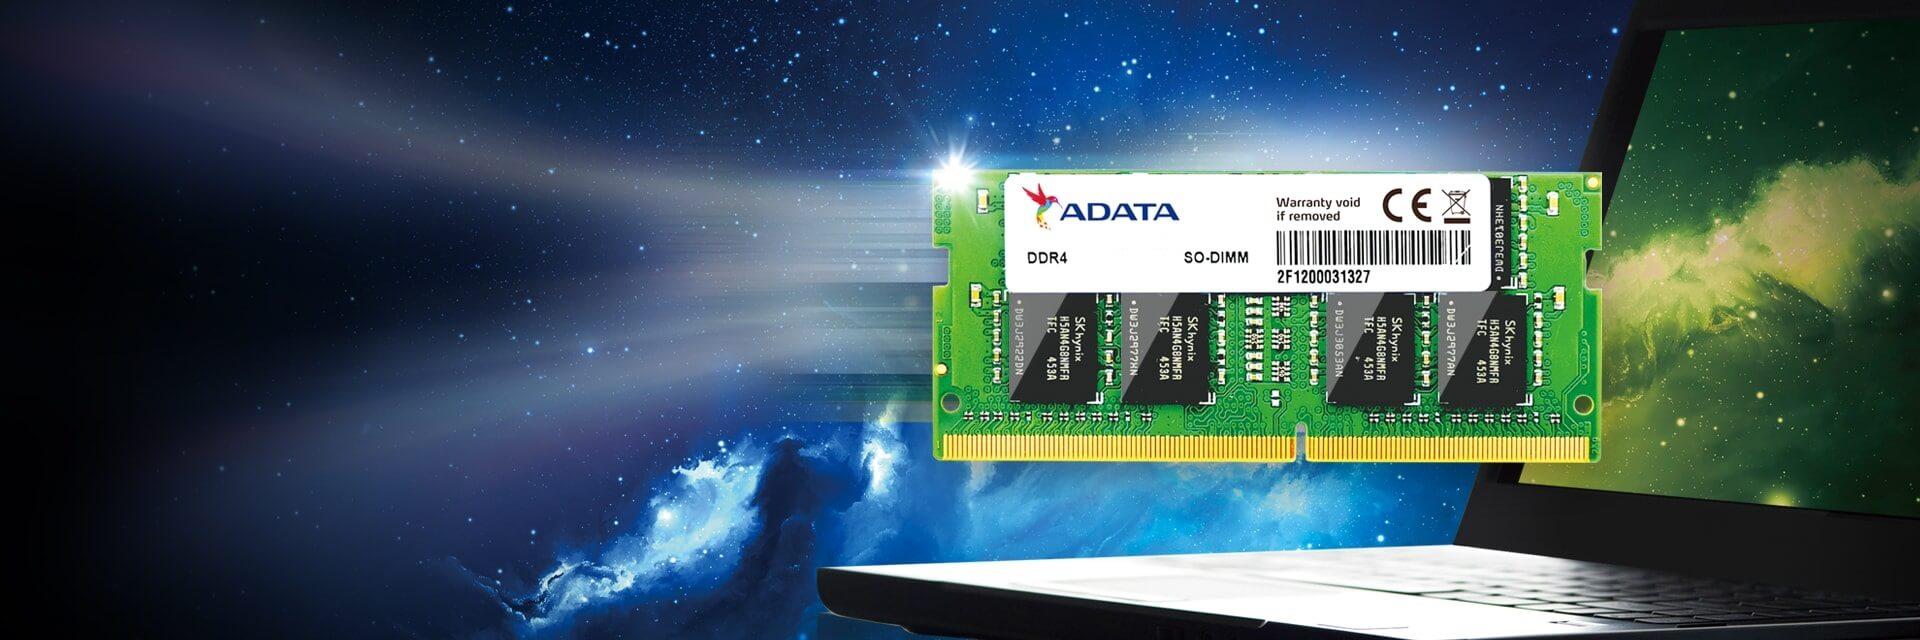 Ram laptop ADATA 16GB DDR4 3200MHz SO-DIMM